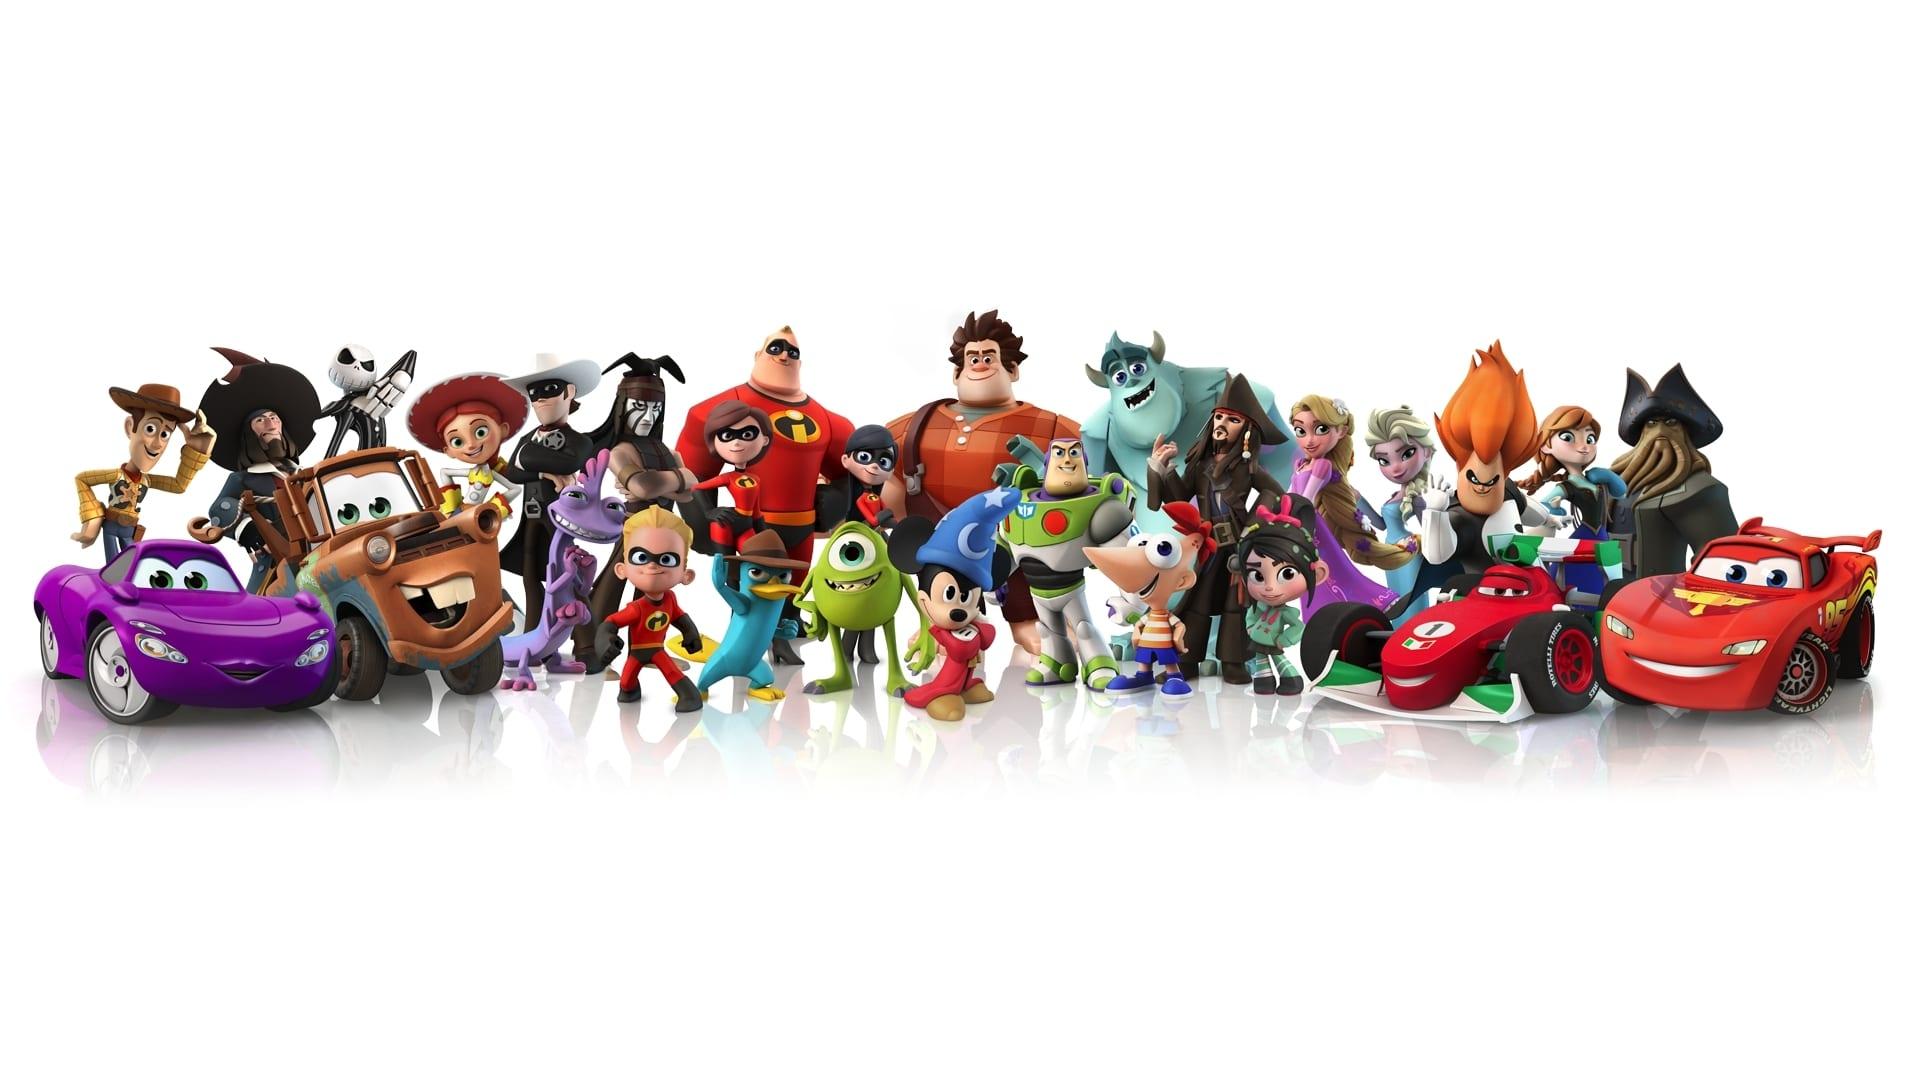 Disney Infinity Character Lineup